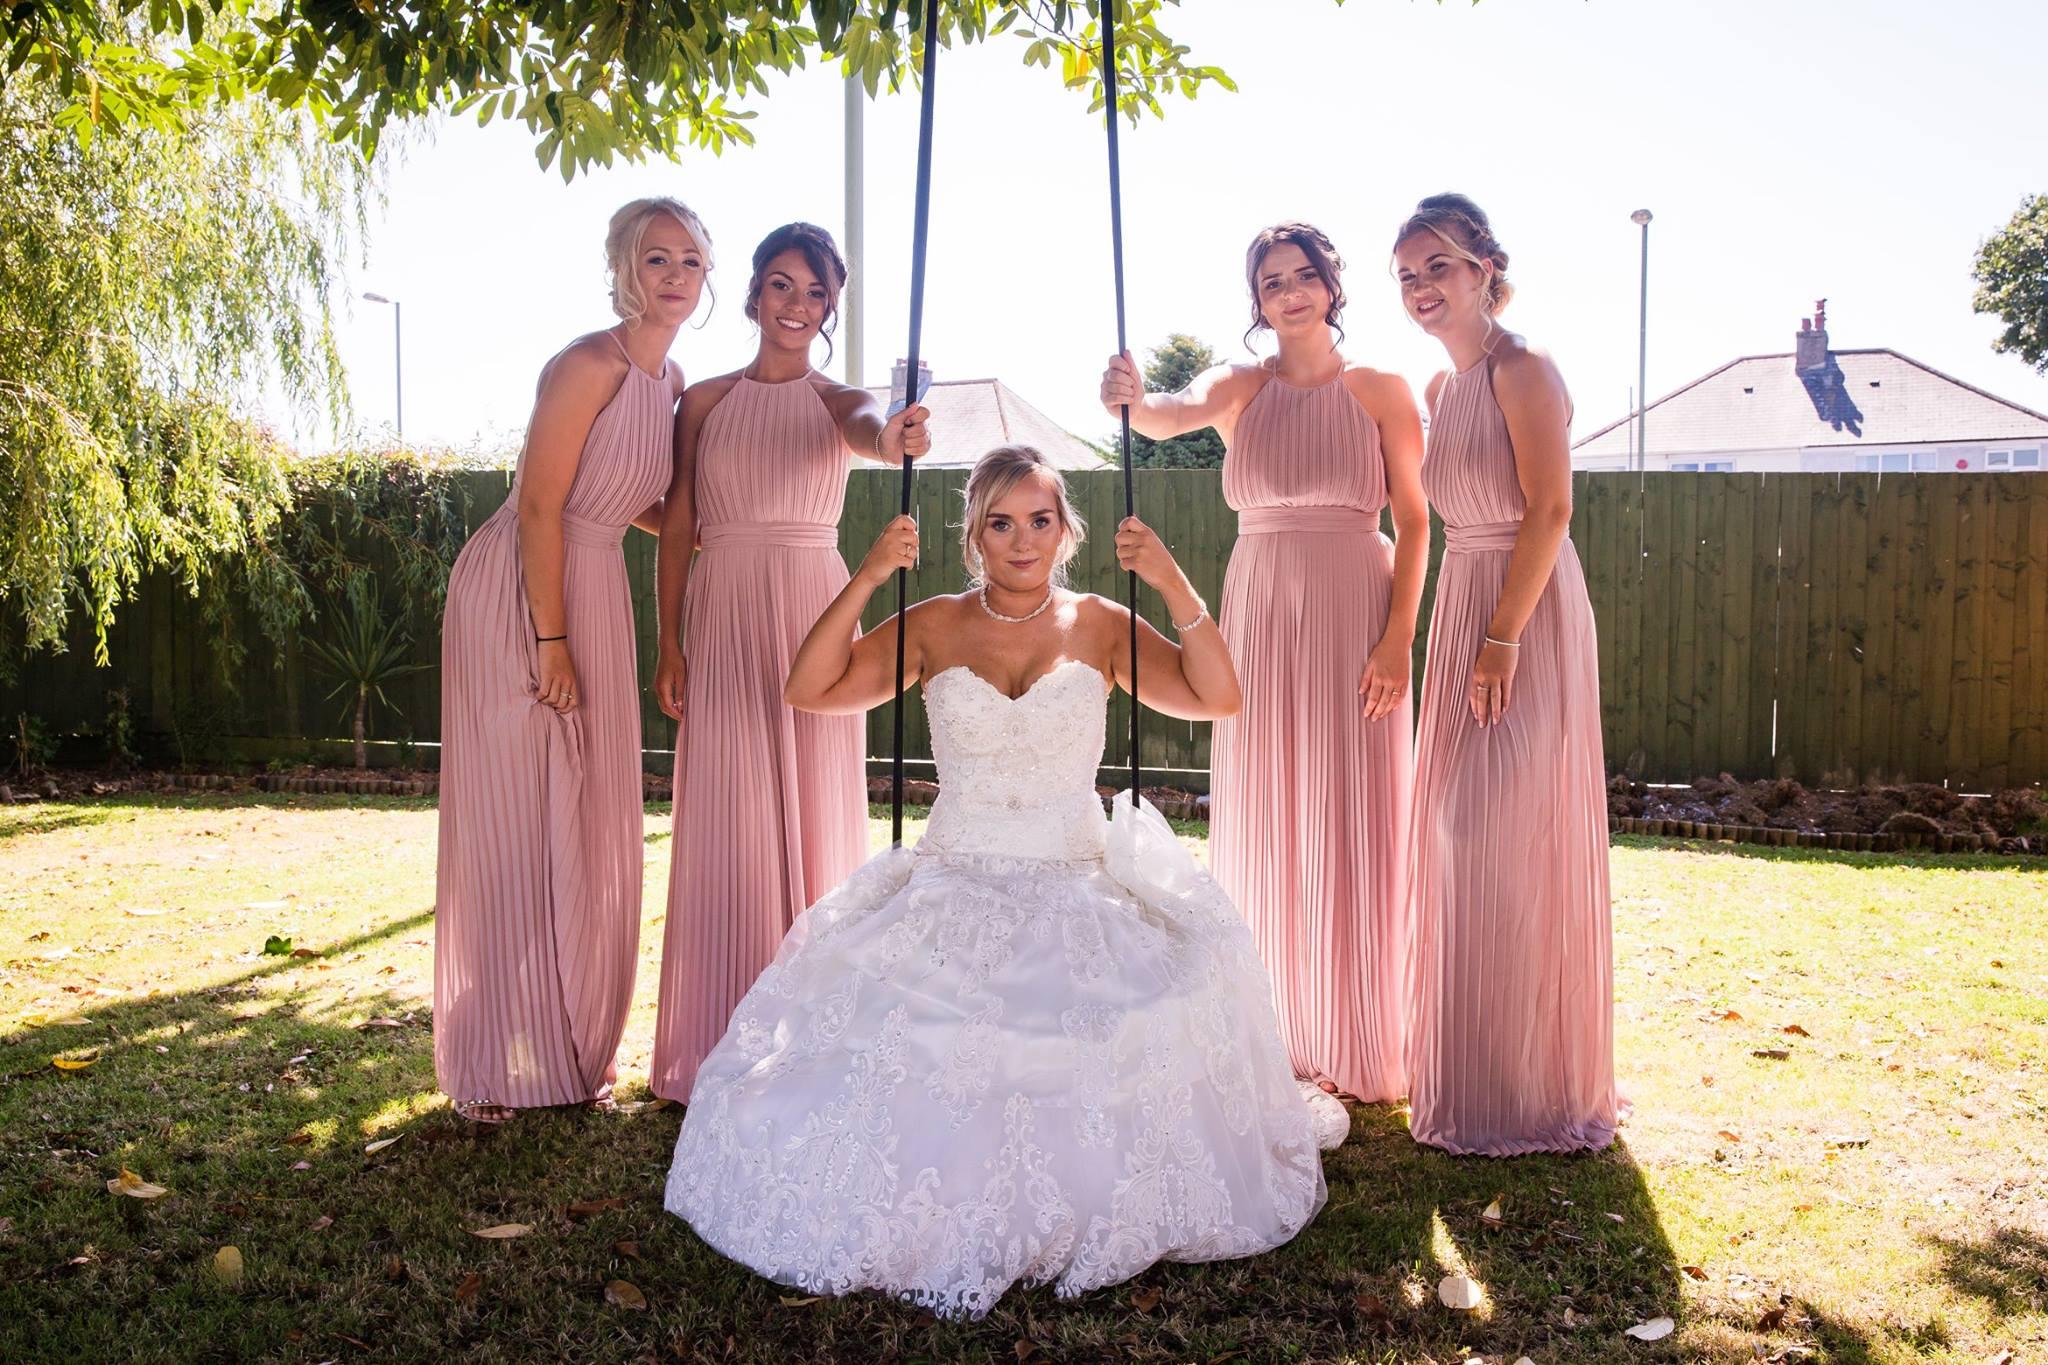 Cornwall Parties   Wedding DJ, Mobile Disco, Photography, Videograpy ...